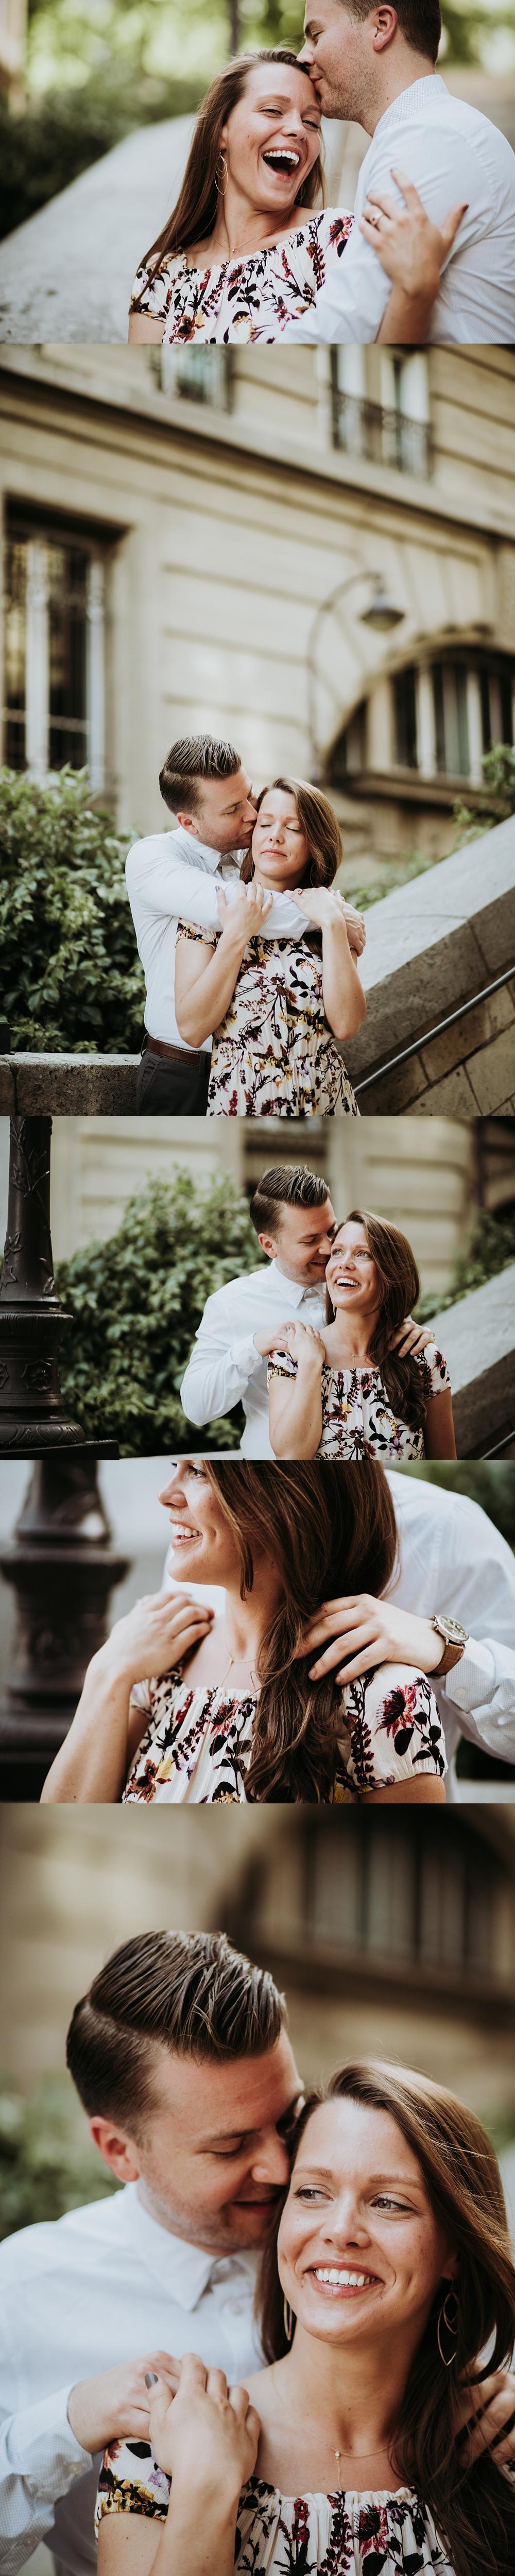 Photographe Mariage Paris Wedding Photographer Paris